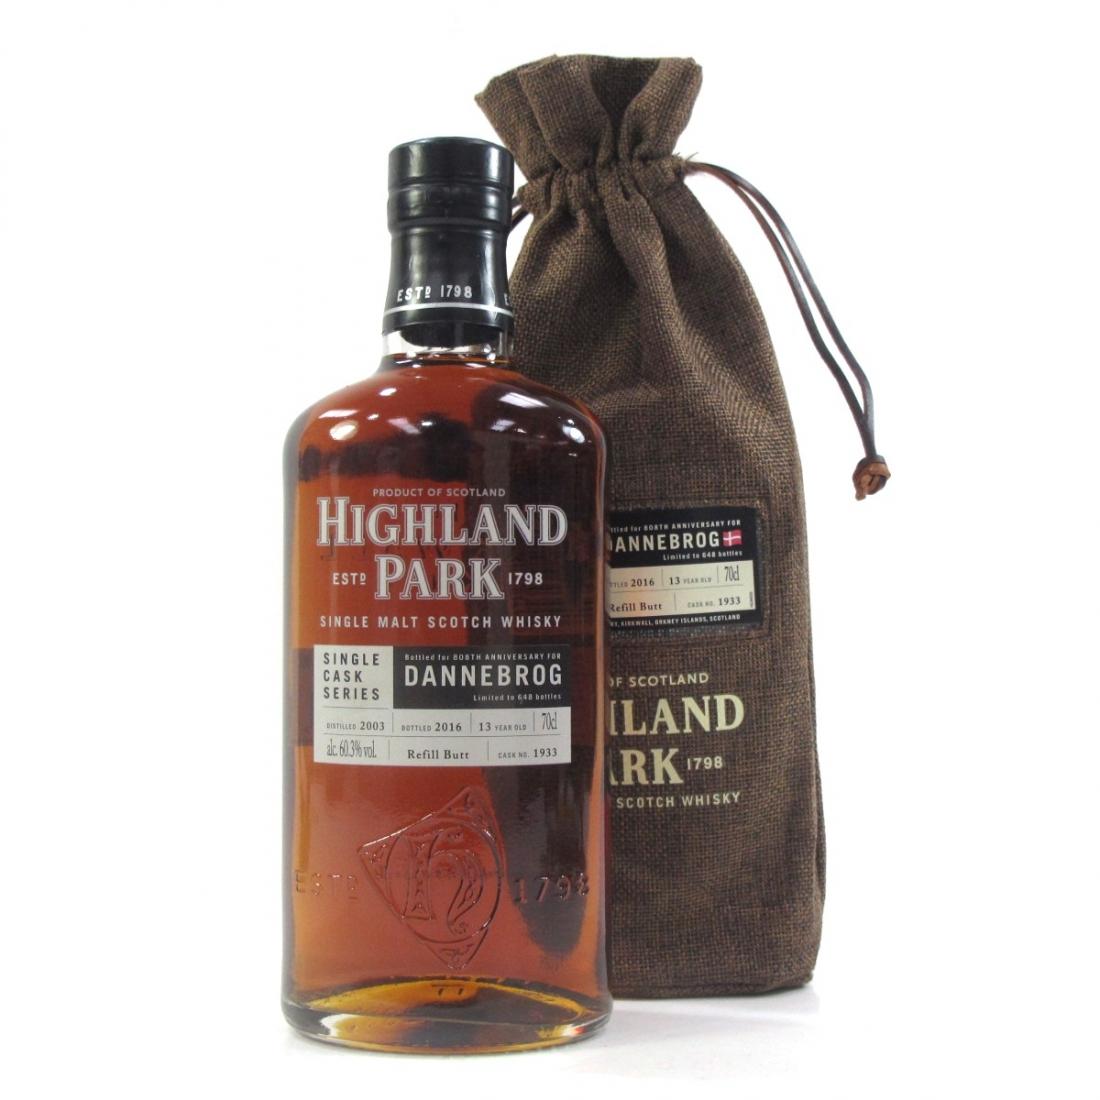 Highland Park 2003 Single Cask 13 Year Old #1933 / Dannebrog 808th Anniversary